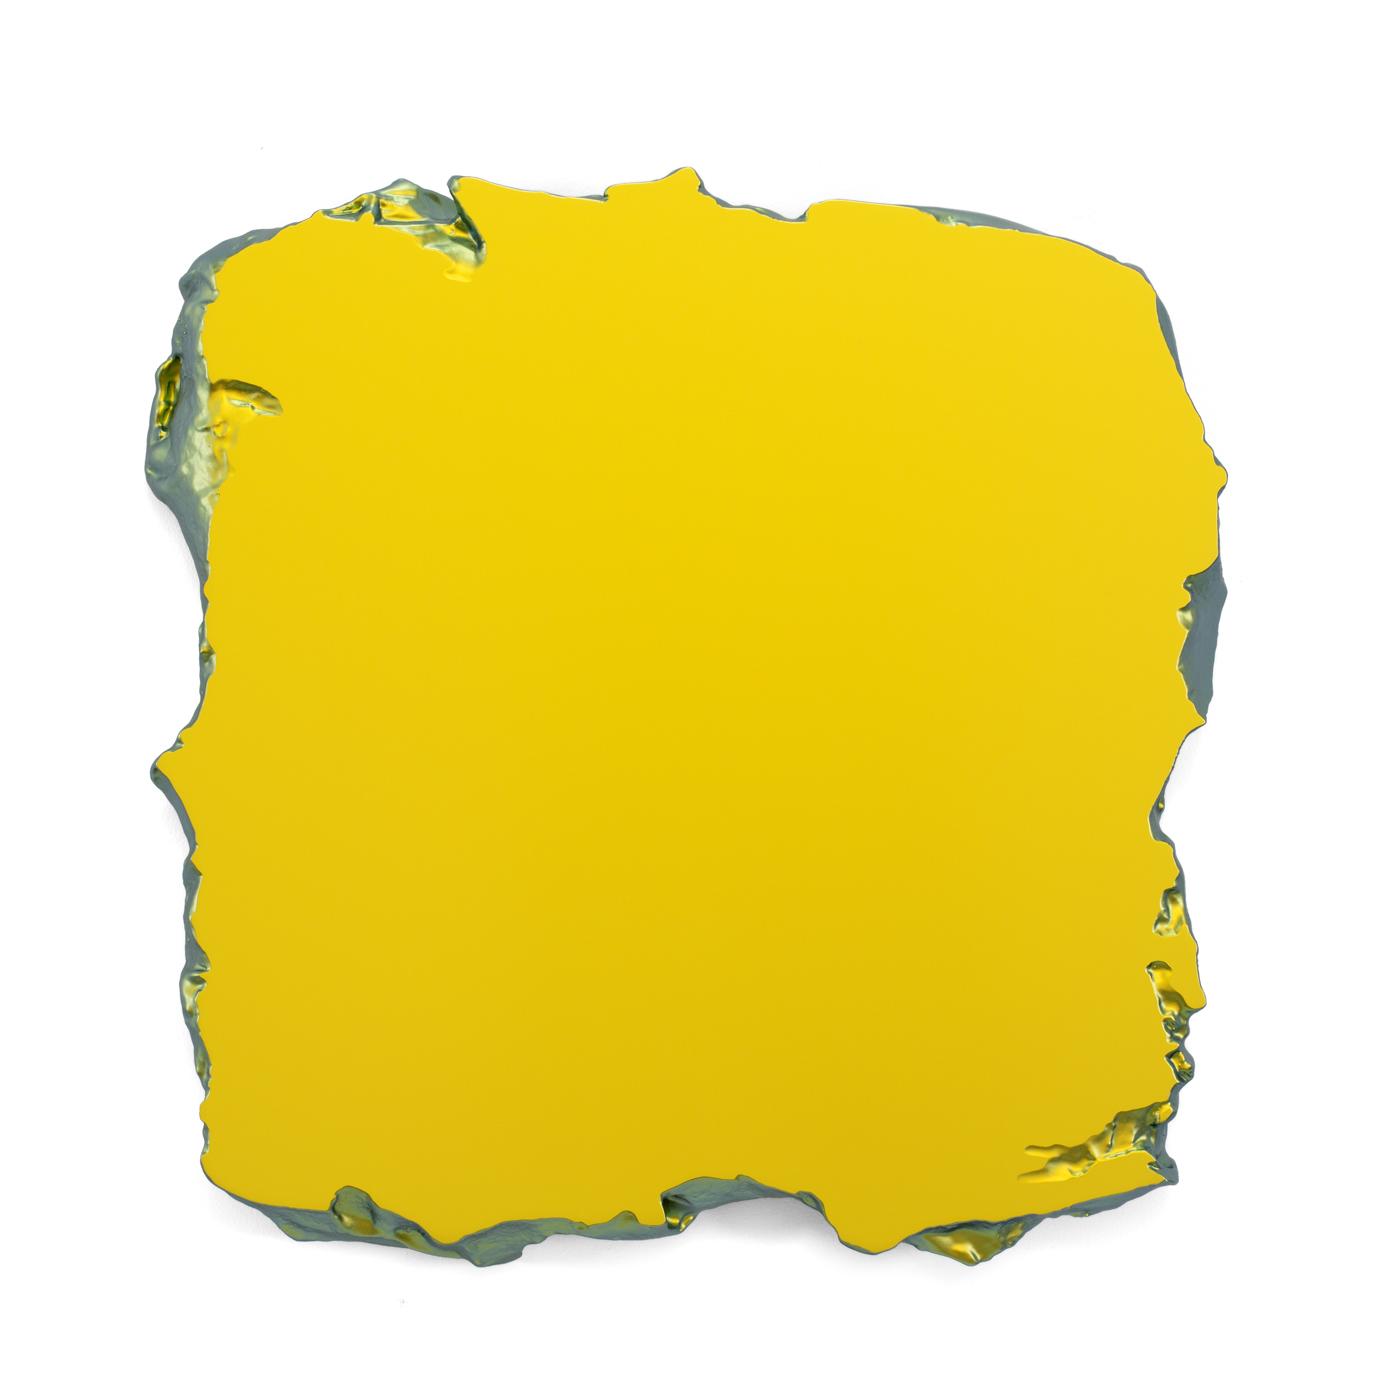 Juri Markkula Gold to Green 50x50cm Interference pigment, polyurethan